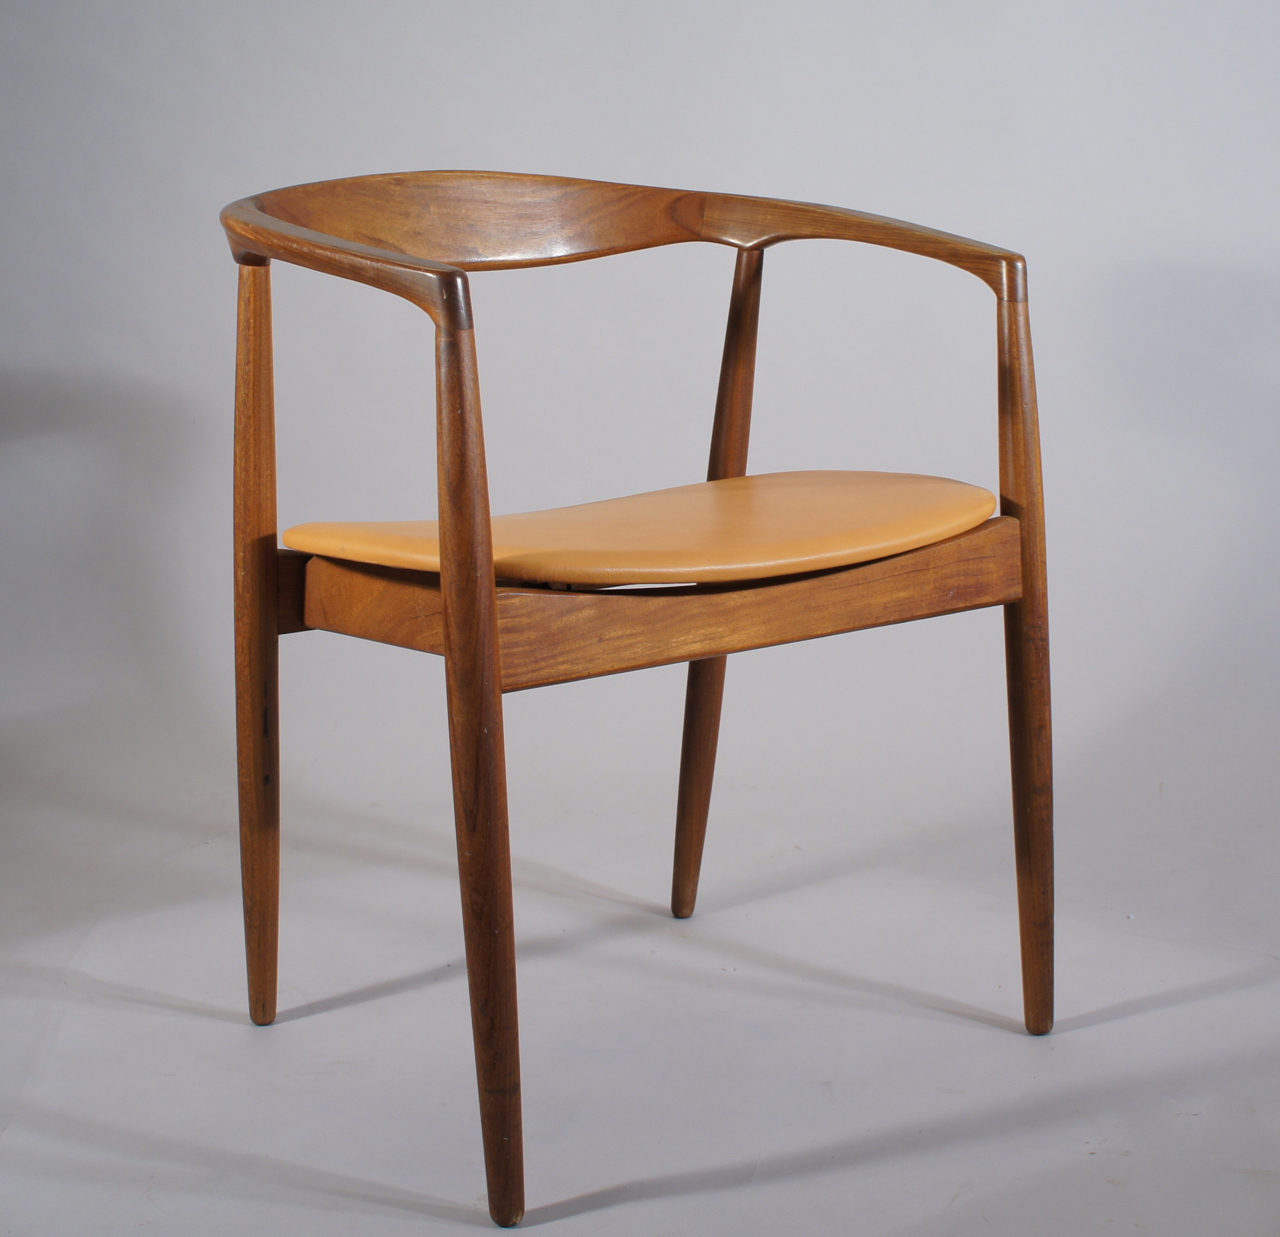 Kai kristiansen for ikea troja sold wigerdals v rld for Ikea armchair bed